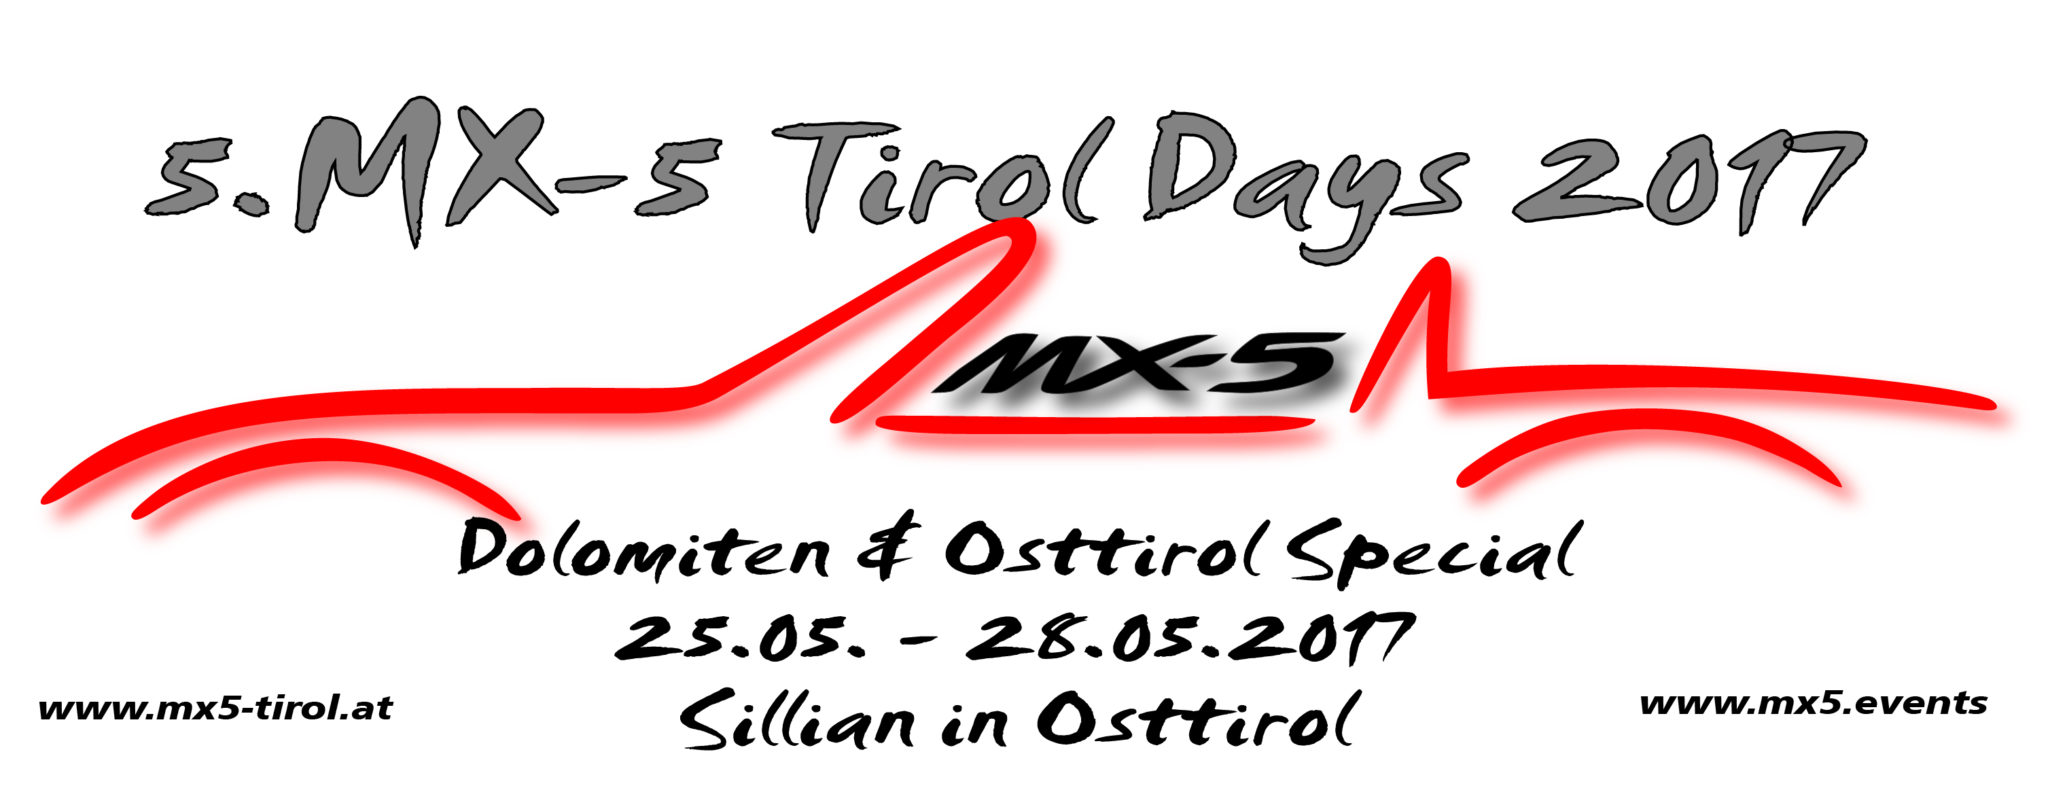 Tirol Days 2017 - Dolomiten Special